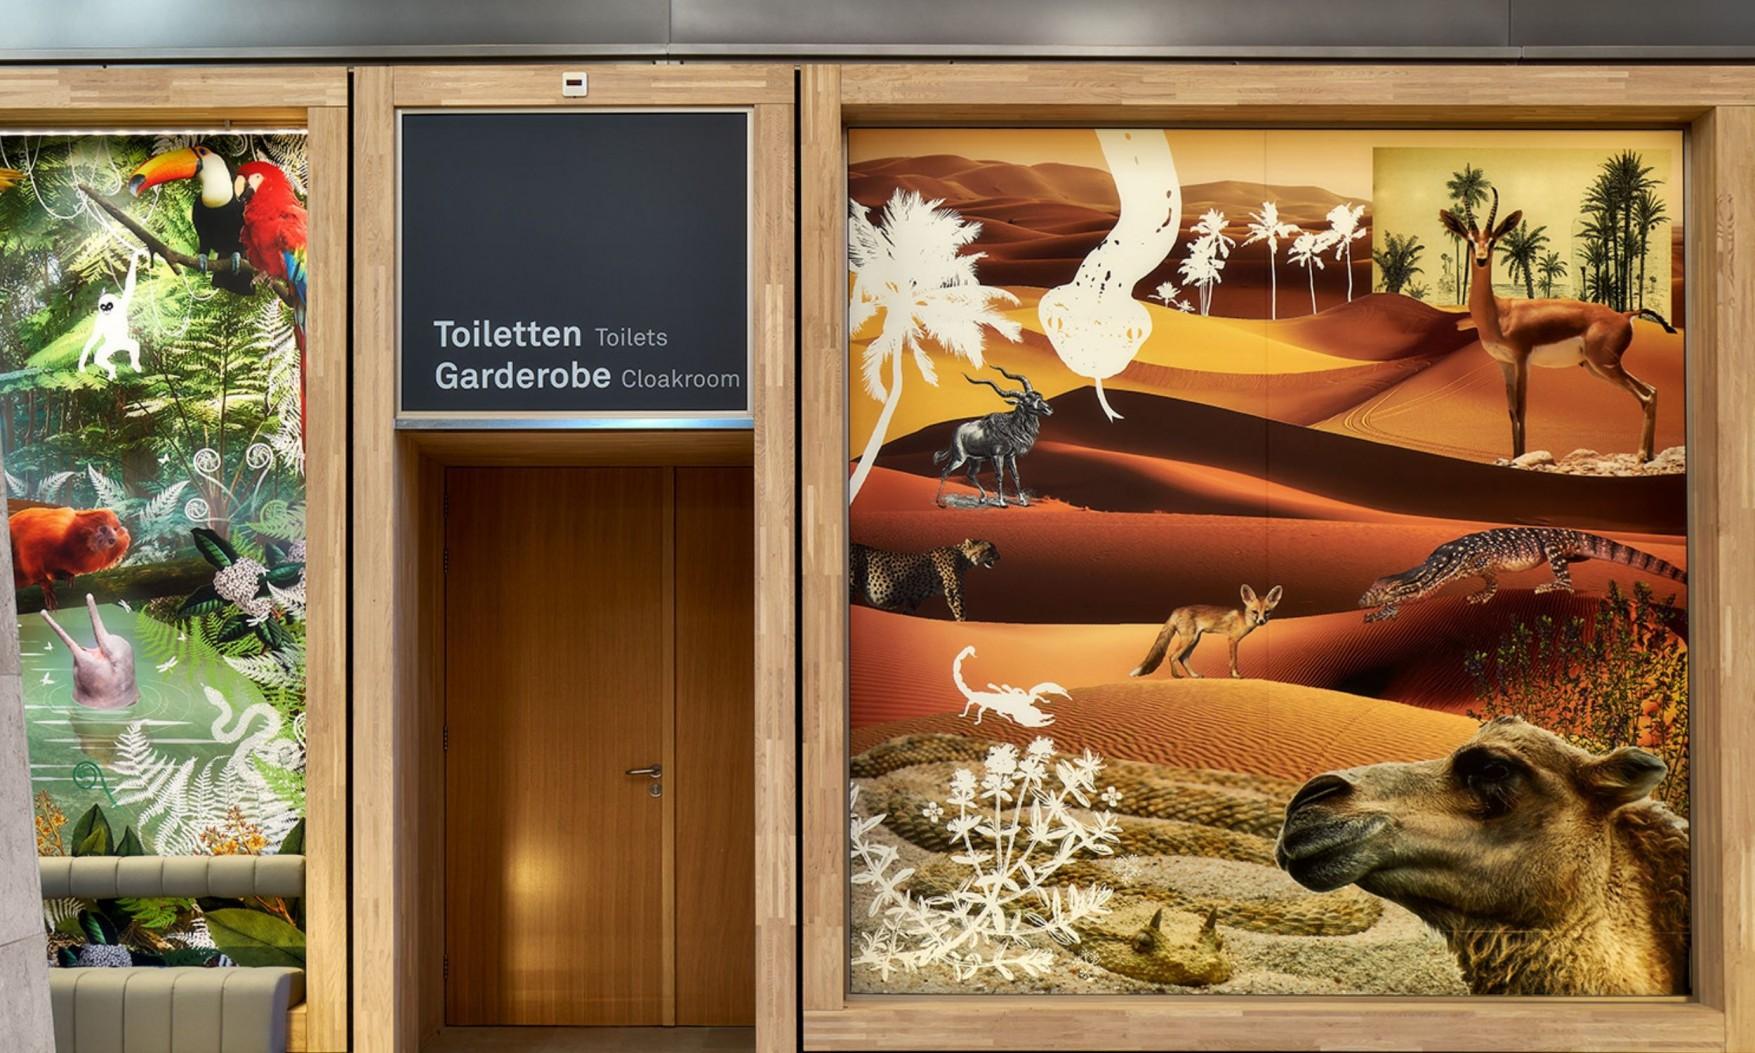 Harryvan Interierbouw | akoestische plafond en wandbekleding (Naturalis Leiden)